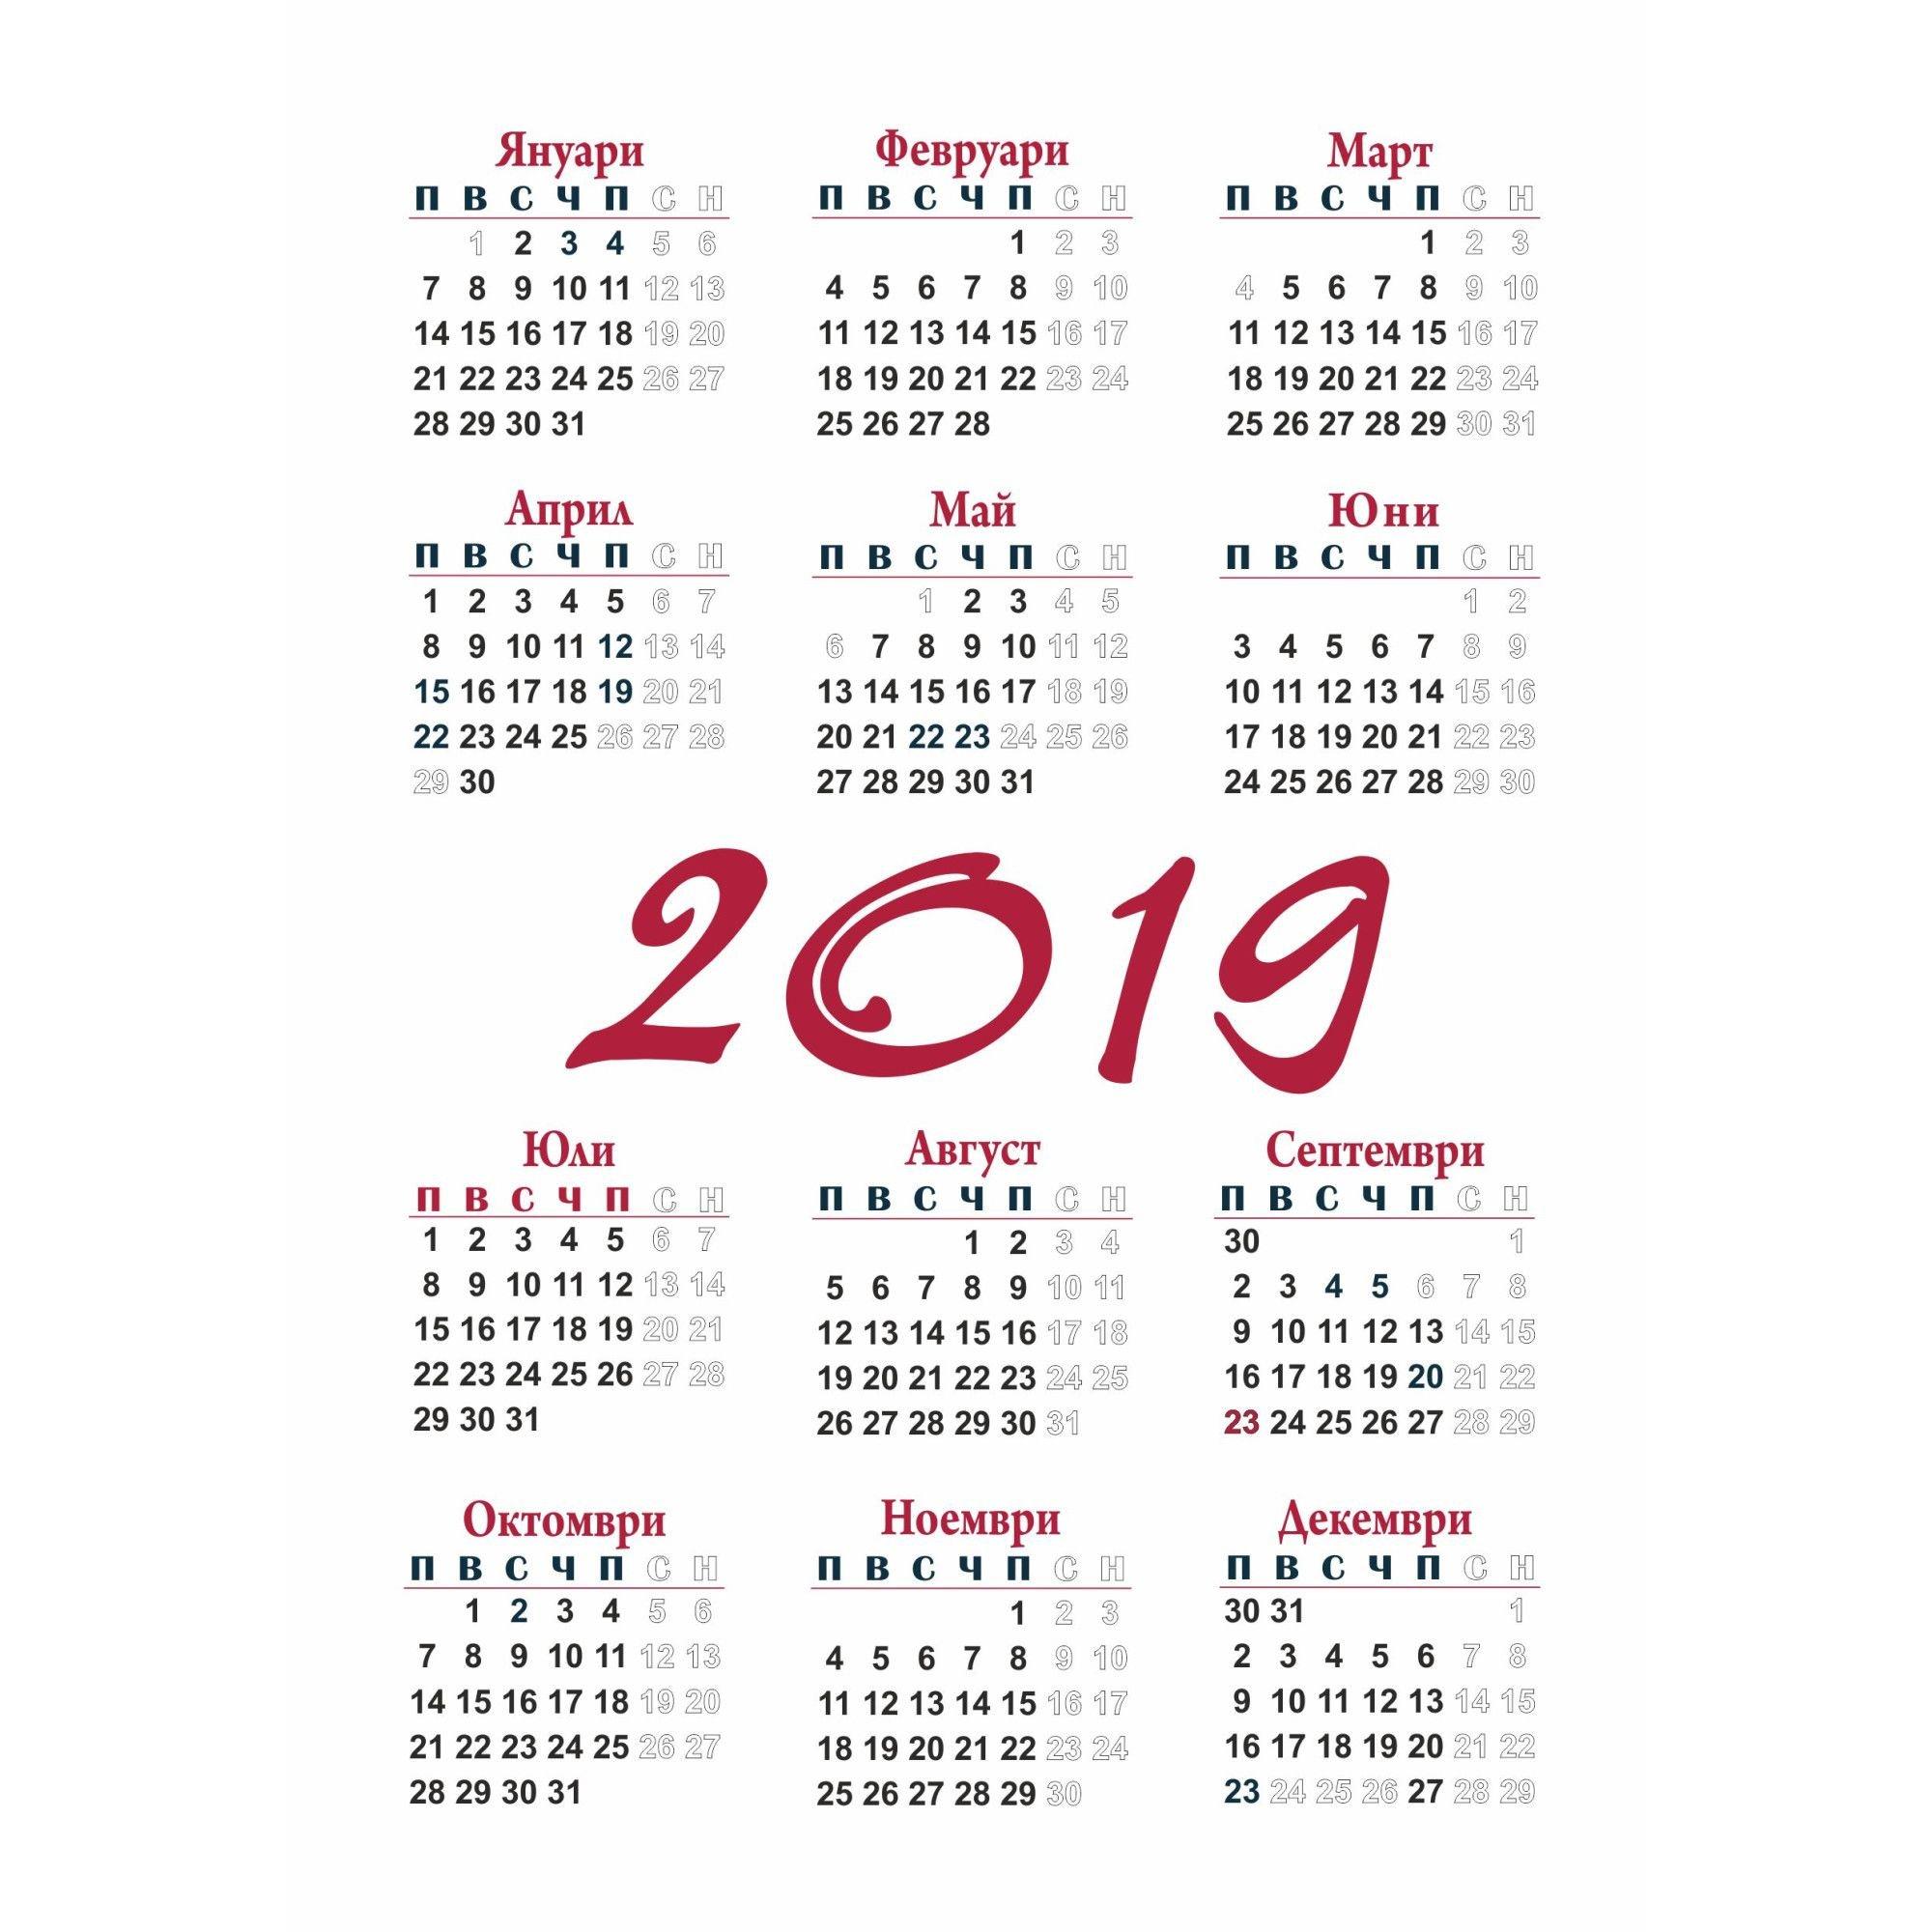 Uncategorized | Download 2019 Calendar Printable With Holidays List Calendar 2019 Za